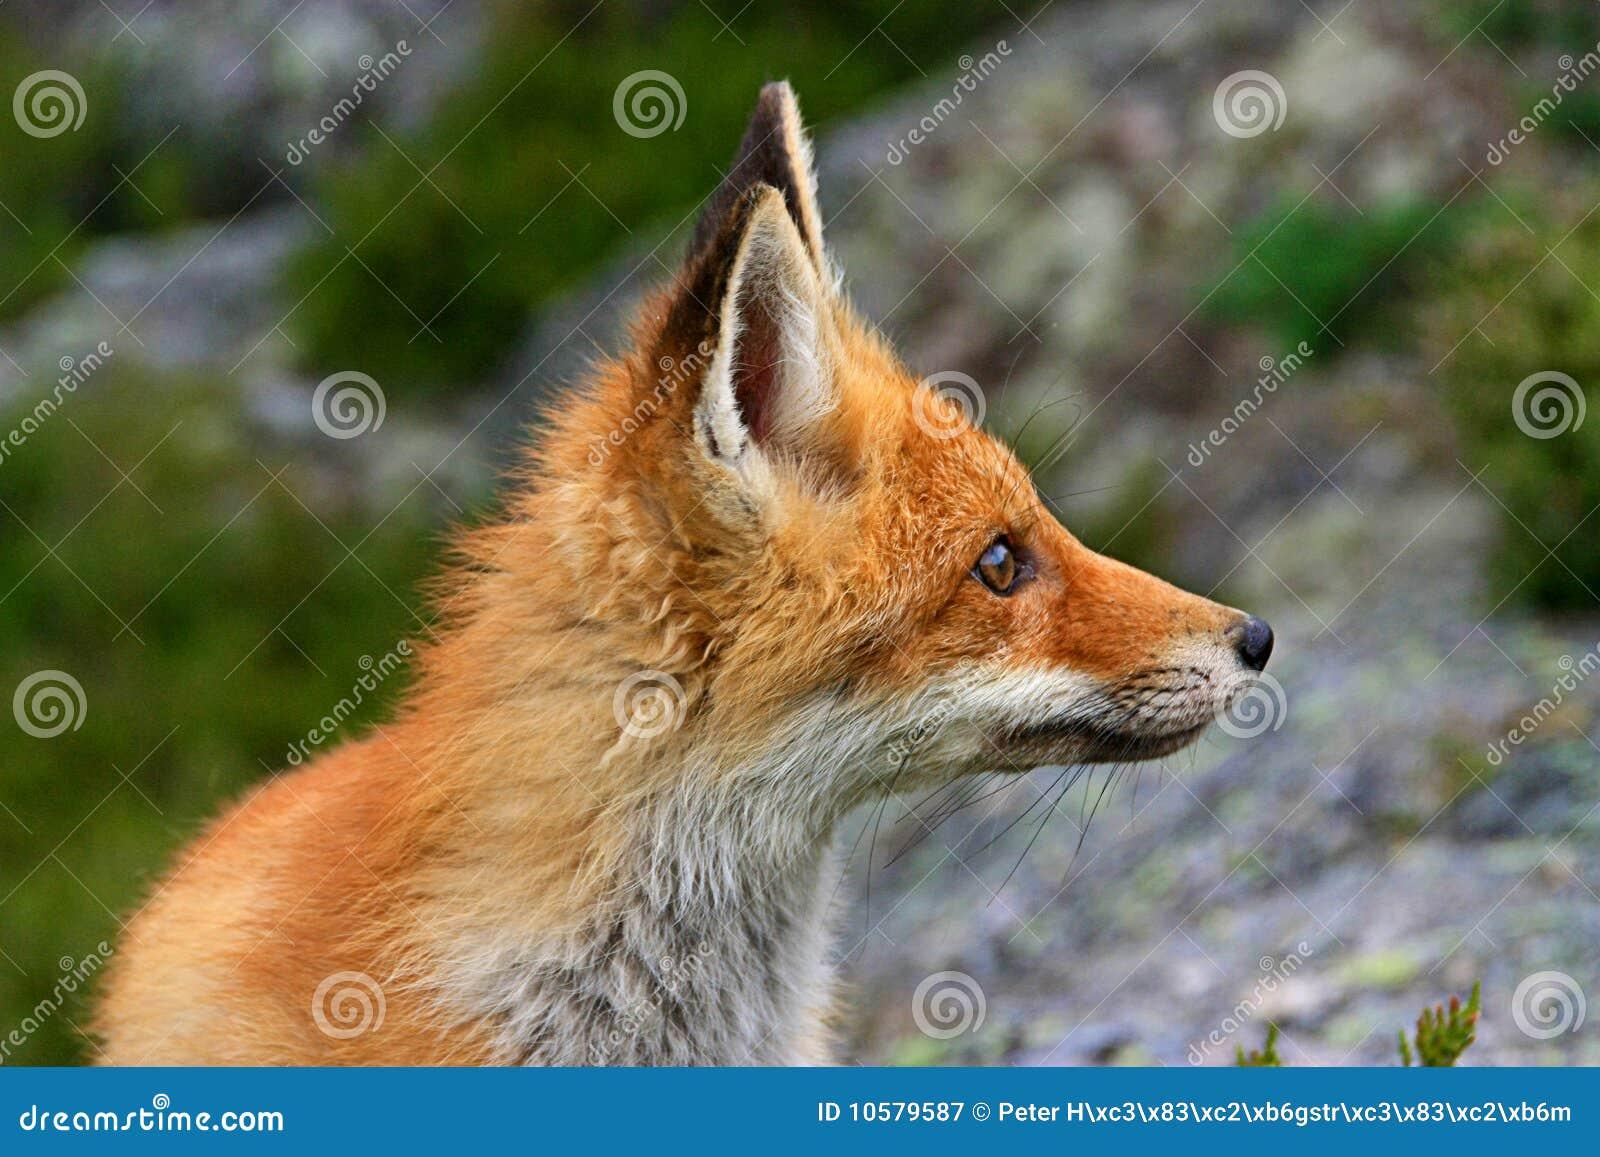 Red fox stock image. I...